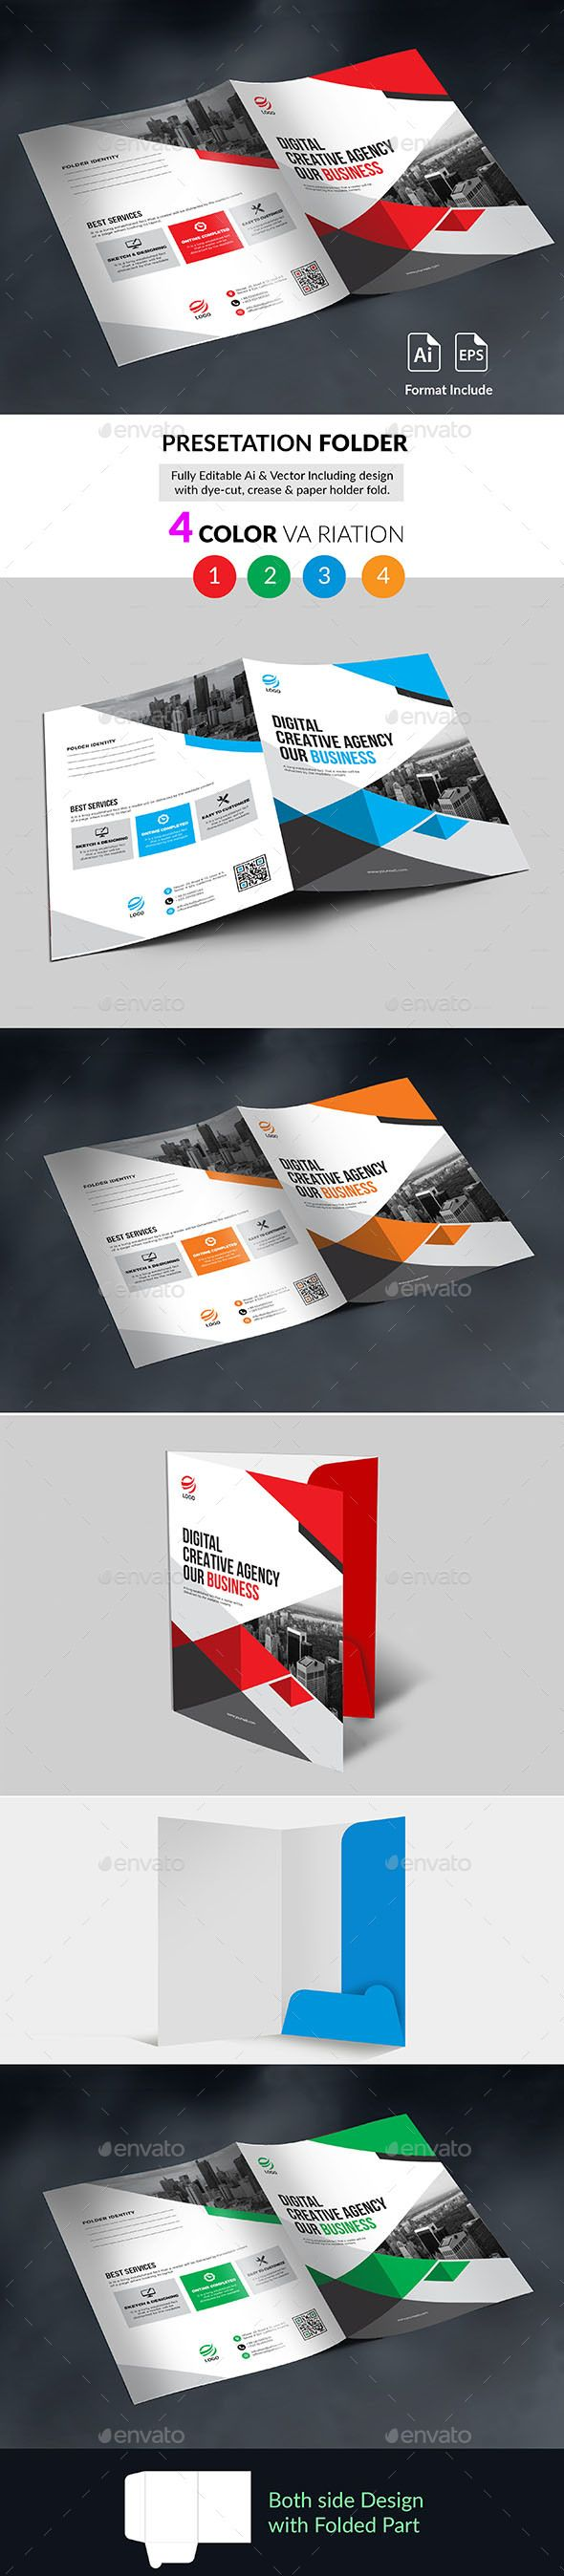 Presentation Folder Template Vector EPS, AI Illustrator | Folder ...